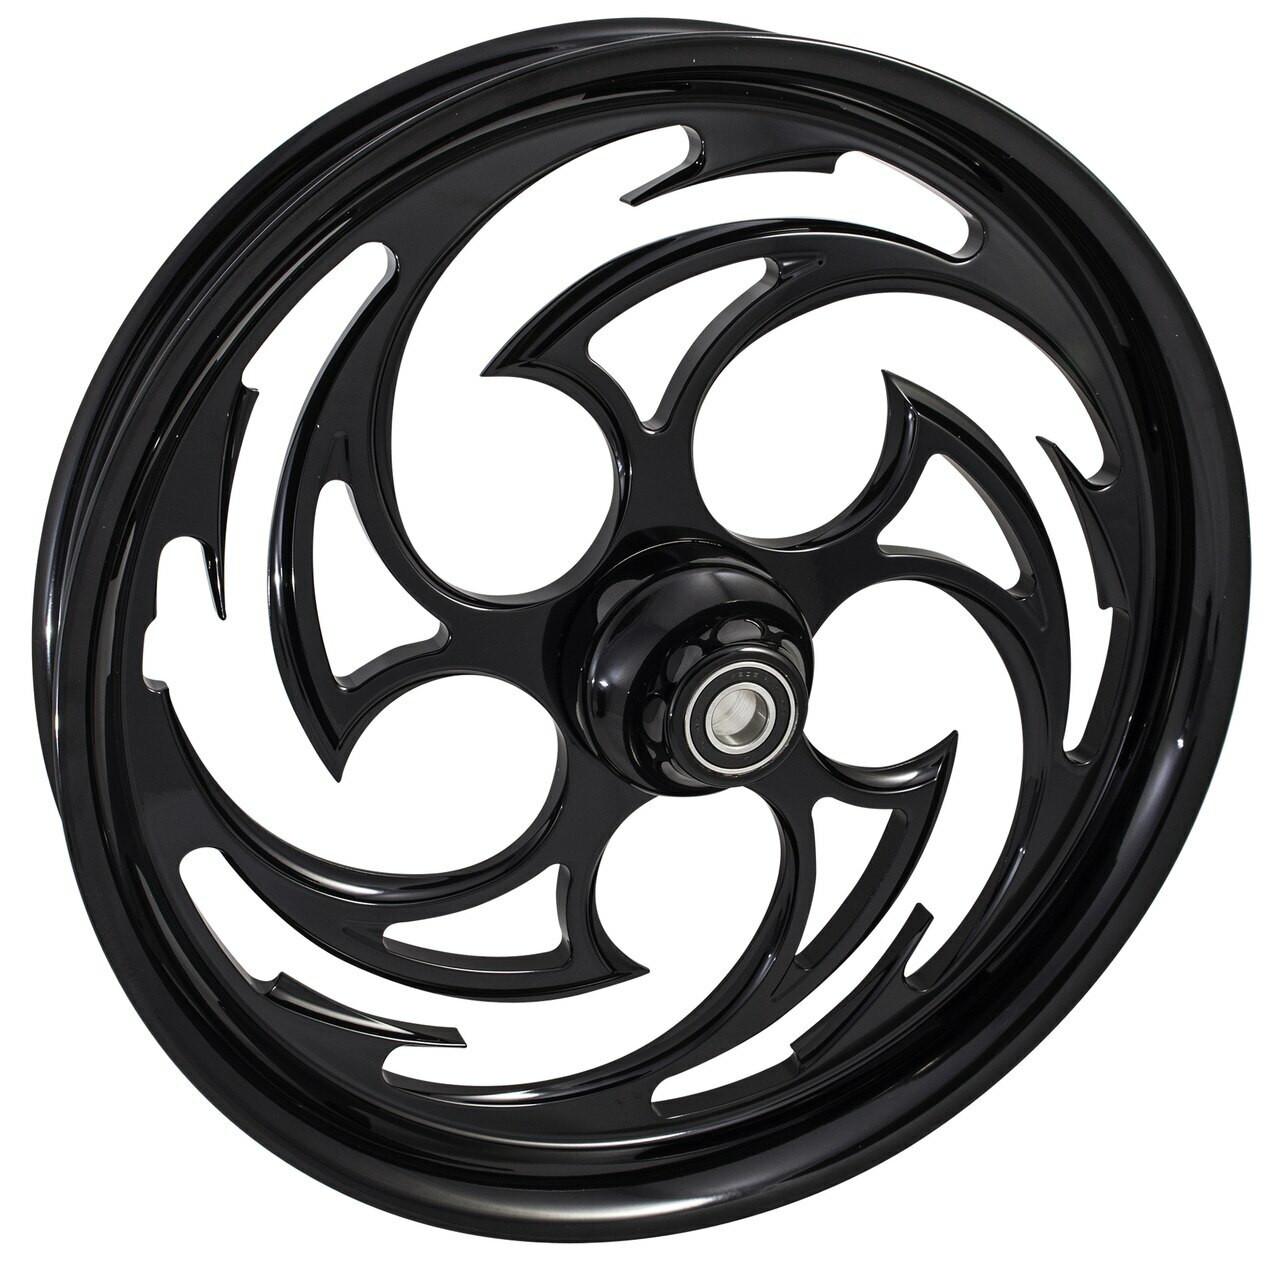 Harley Davidson Black Road King Wheels -Predator